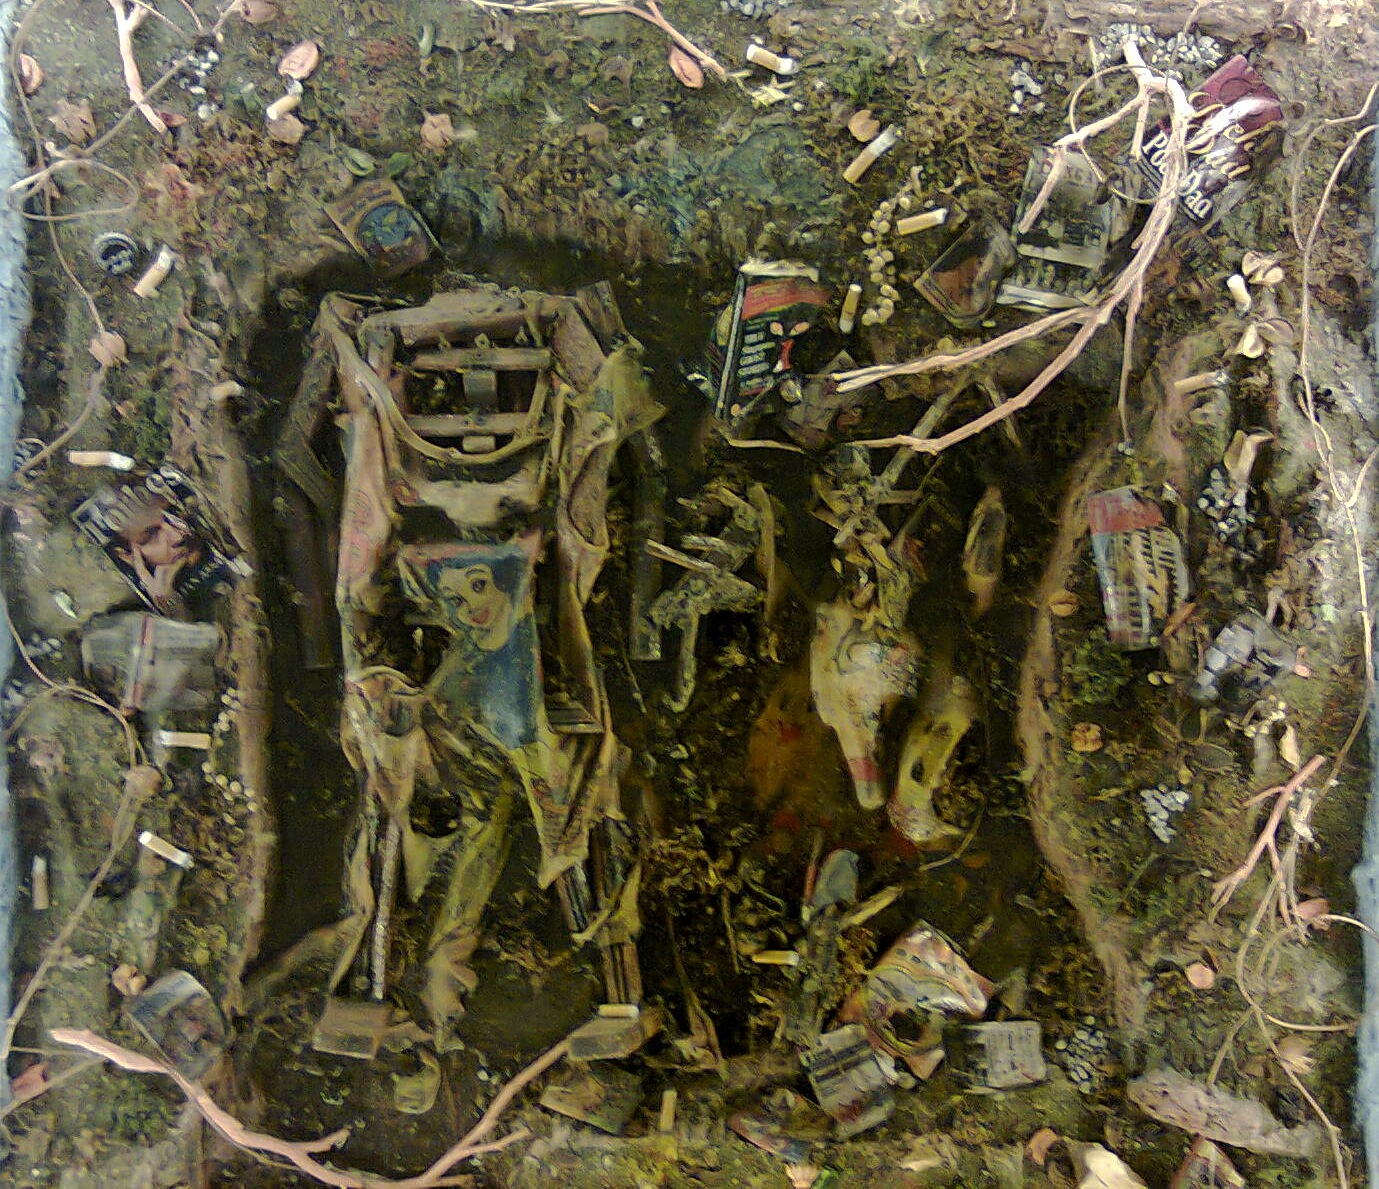 CHUN Kai Qun   The Tragedy of Undoubting  2012 Mixed media H 92 x W 92 x D 20 cm